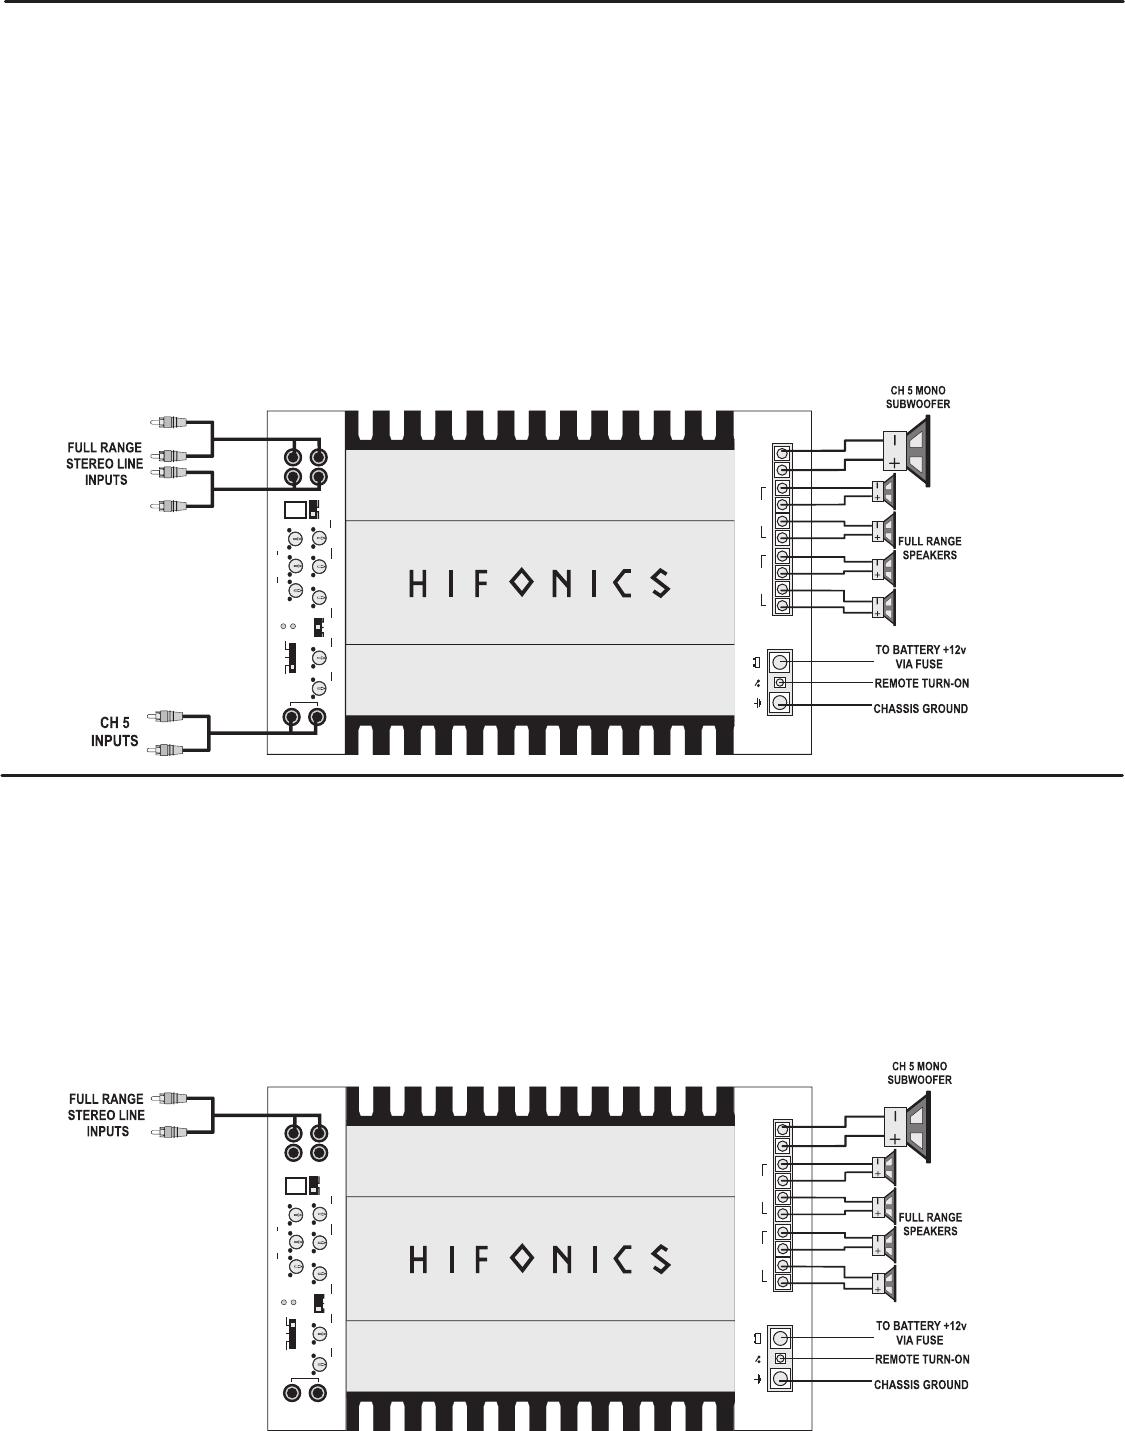 Zeus 2 Channel Amp Wiring Diagram Dvr Recorder 4 6 Speakers Handleiding Hifonics Zxi Pagina 8 Van 14 English On